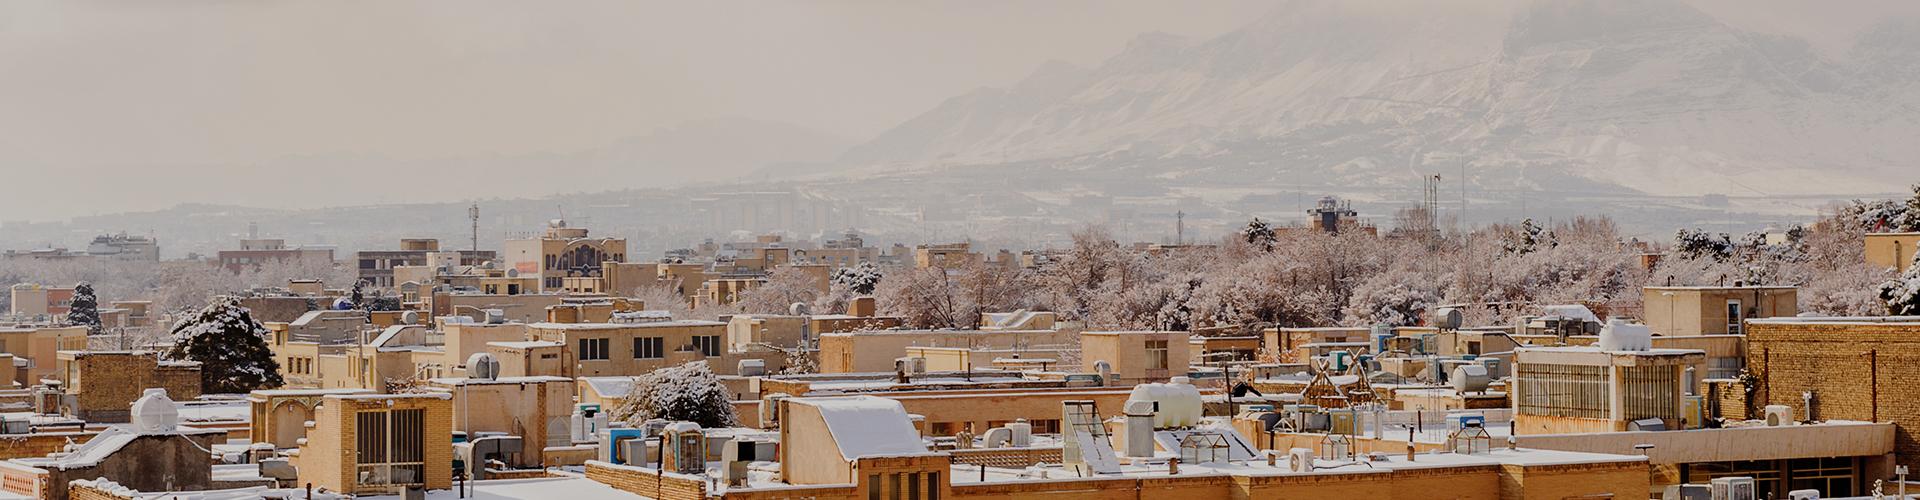 Landmark photograph of Iran